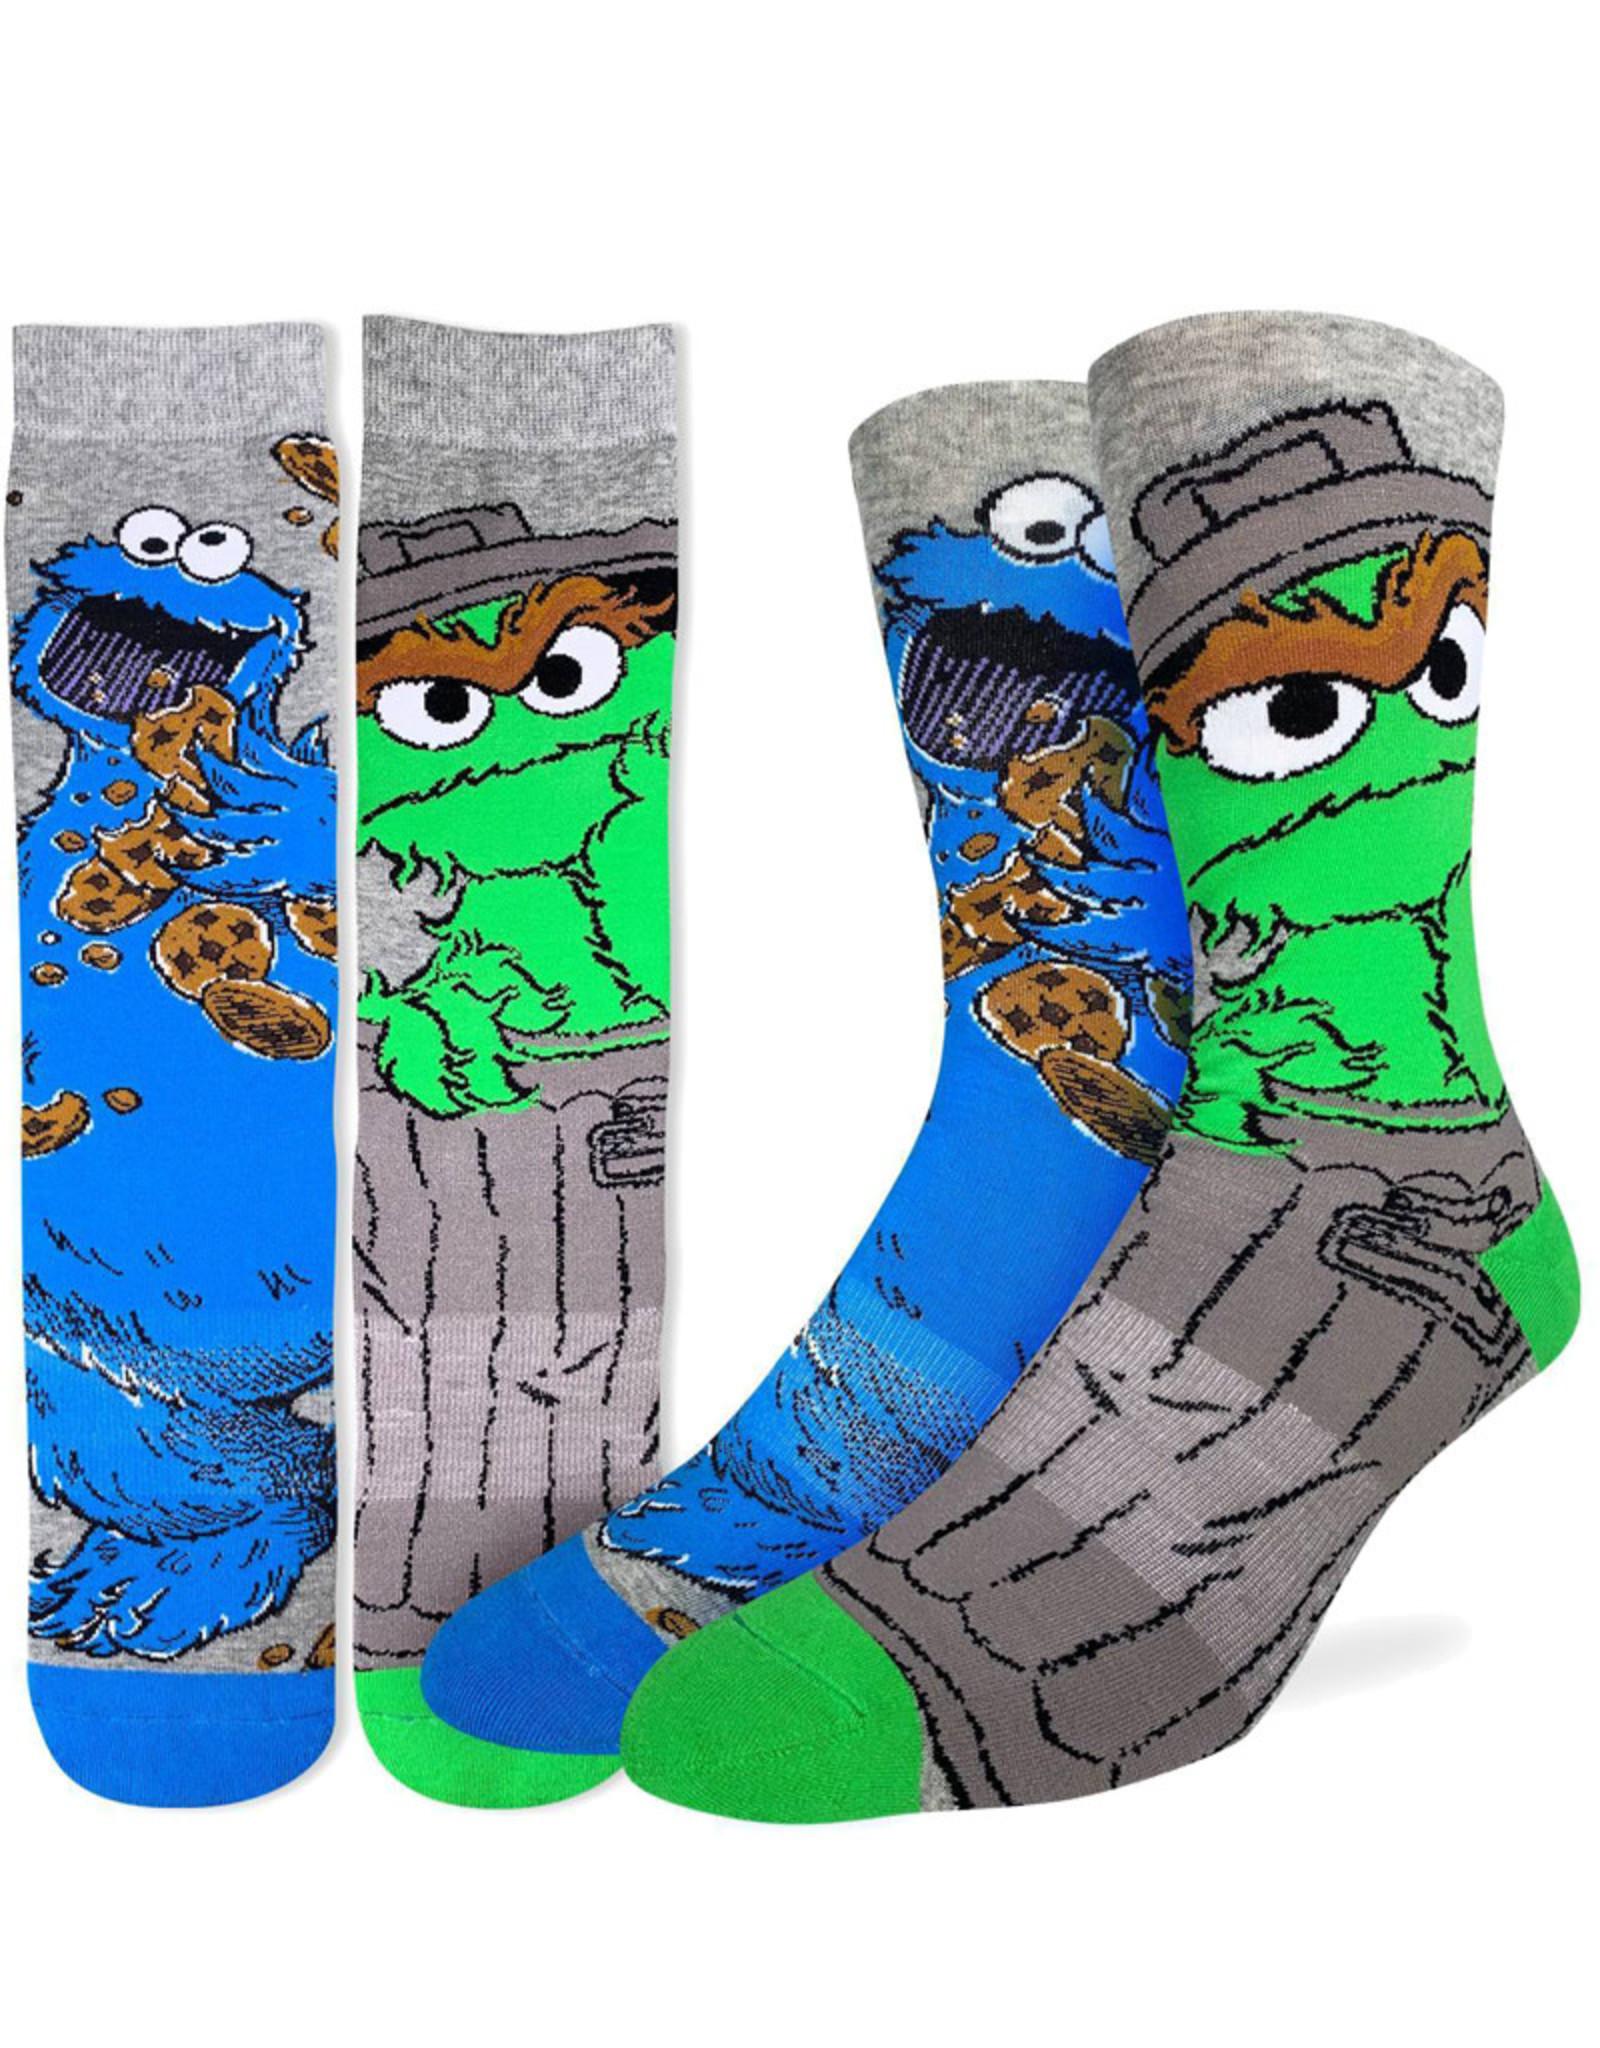 Sesame Street ( Good Luck Sock ) Oscar And Cookie Monster